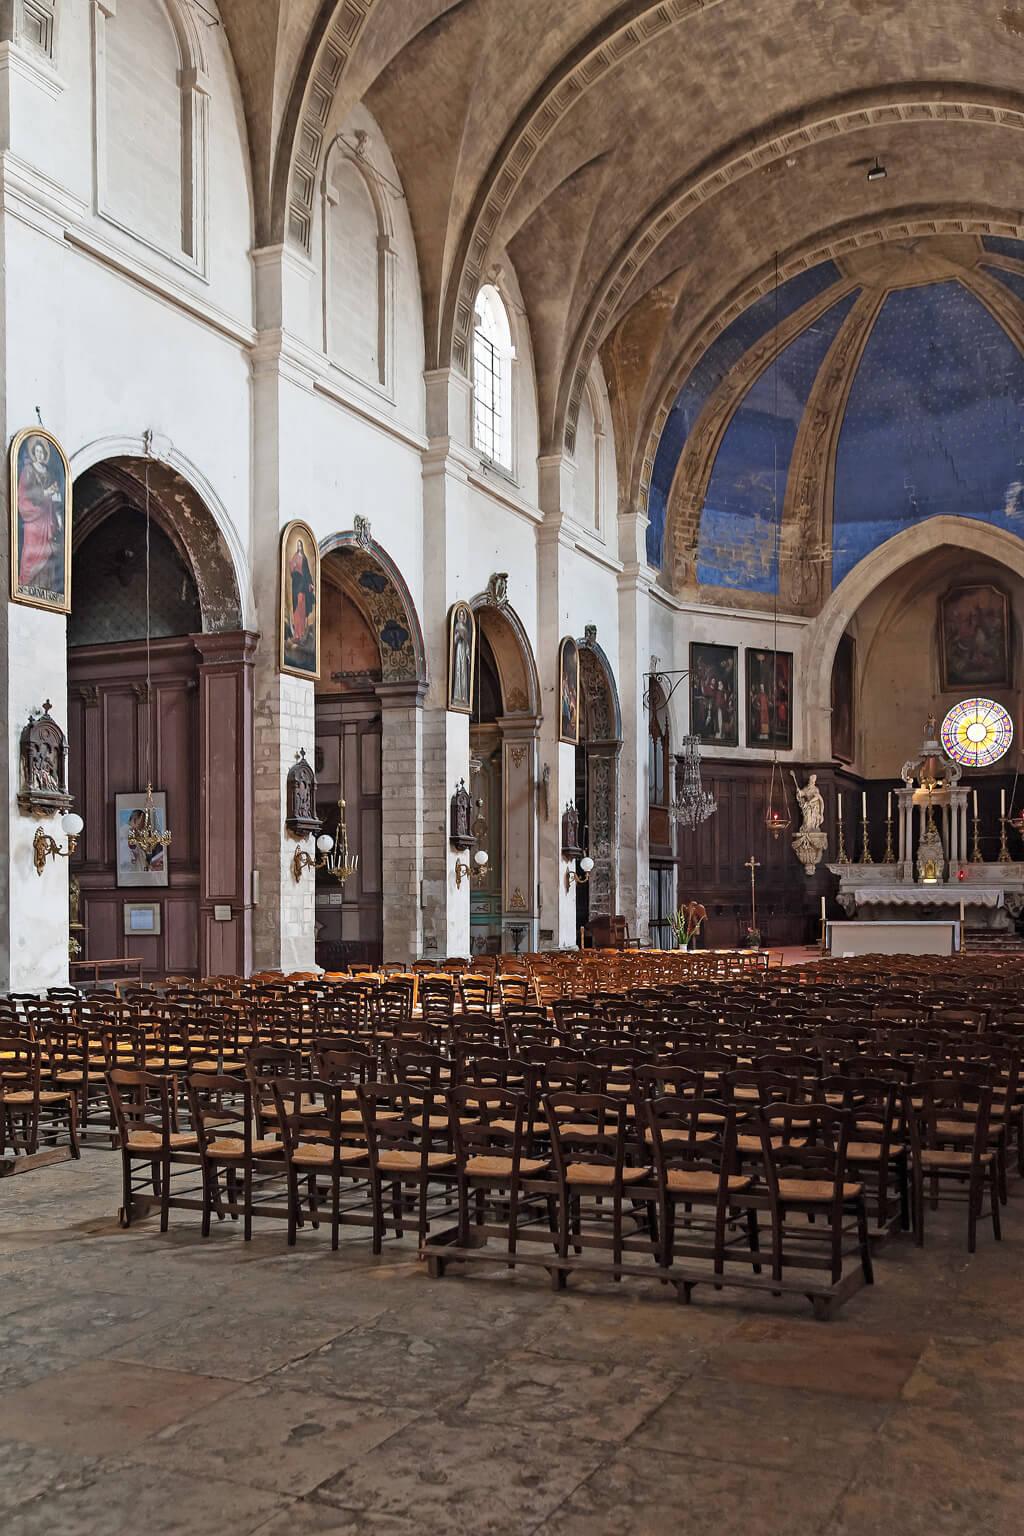 Cathedral interior - Avignon, France. Photo: Haven In.